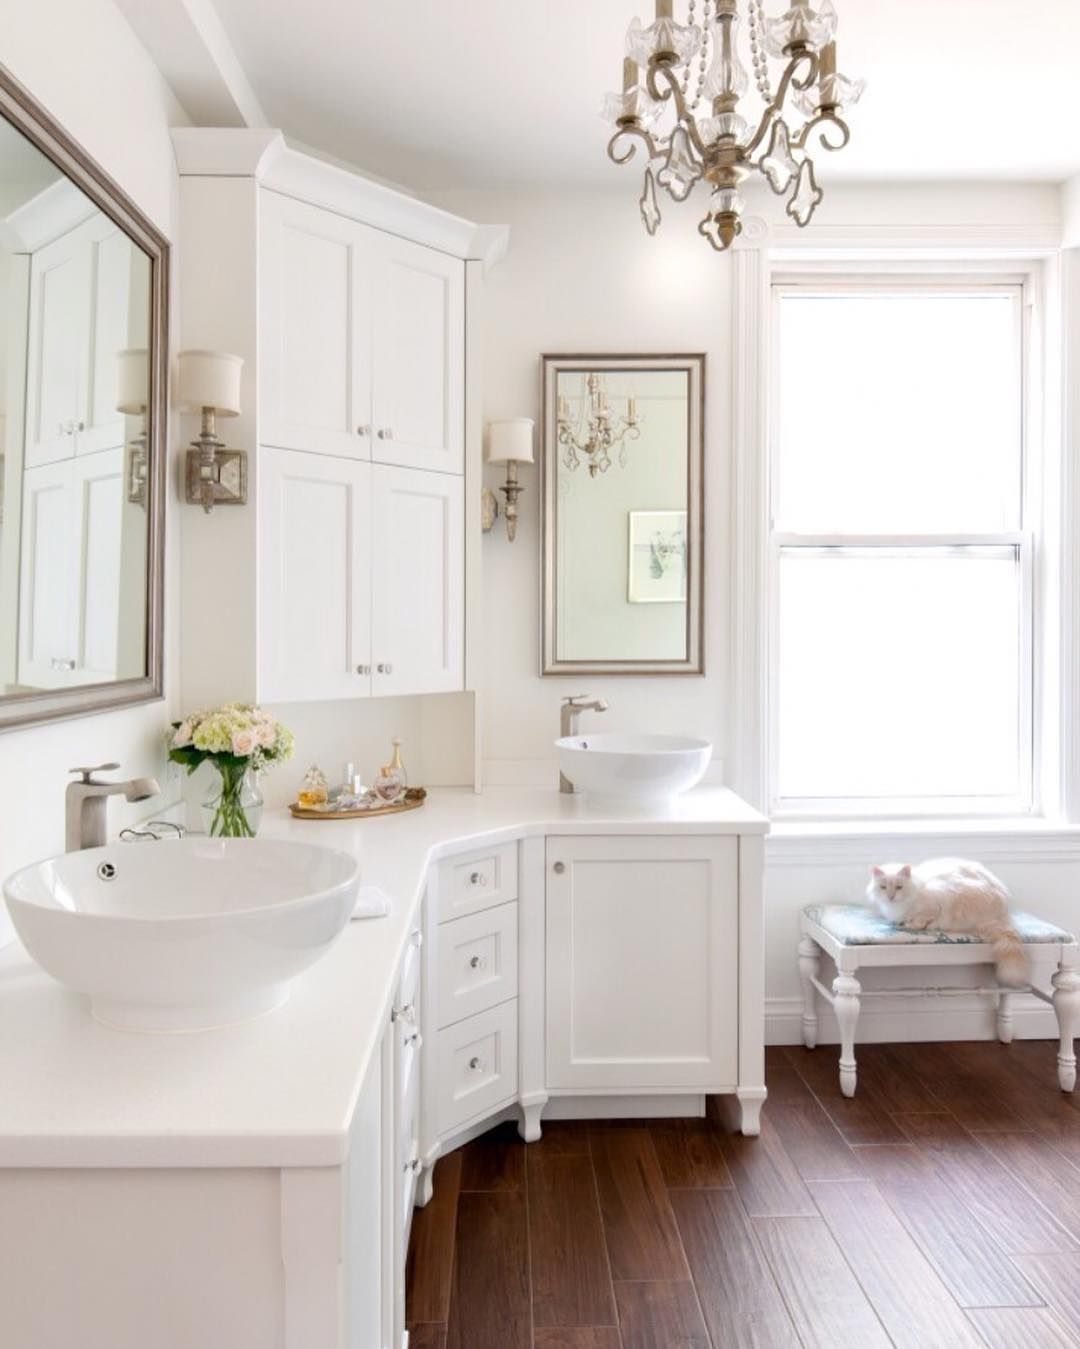 bathroom via happyhappynester on ig | house | Pinterest | Bath, Bath ...